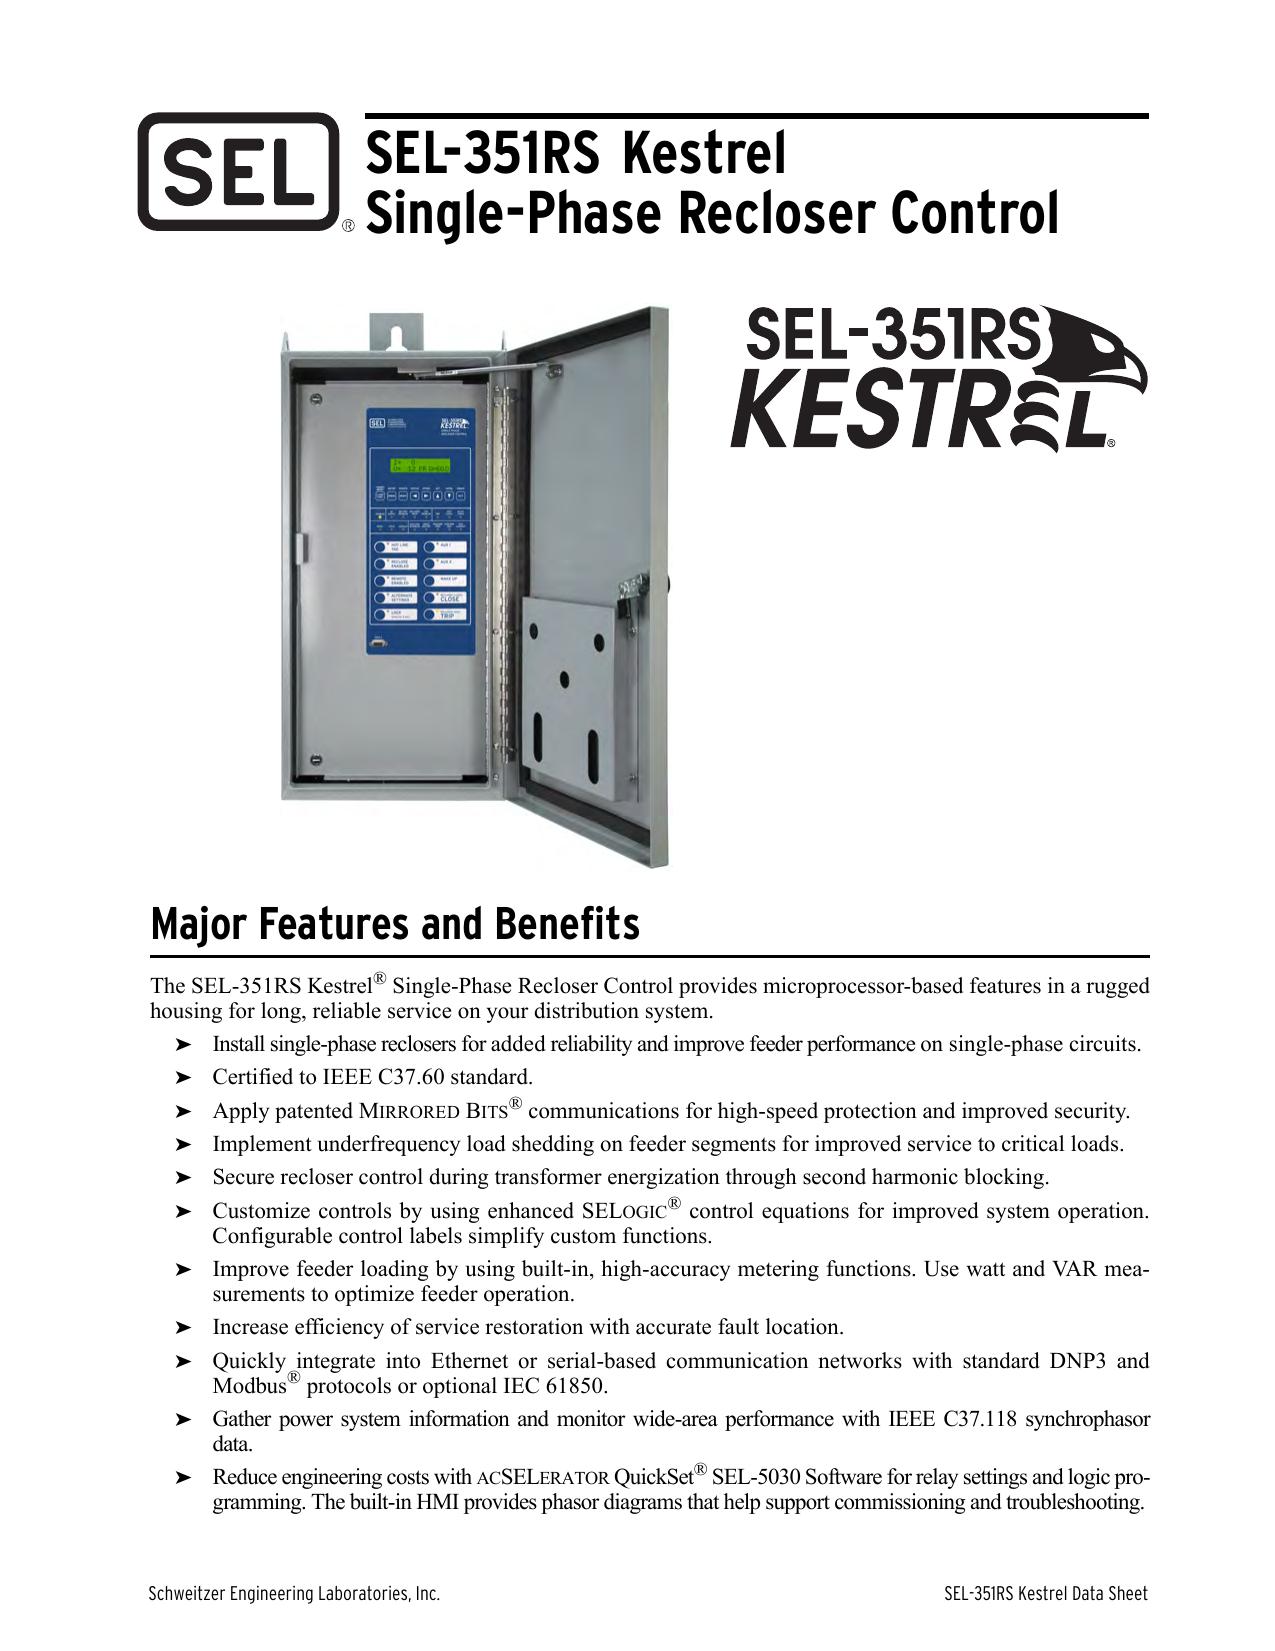 SEL-351RS Kestrel Data Sheet   manualzz com